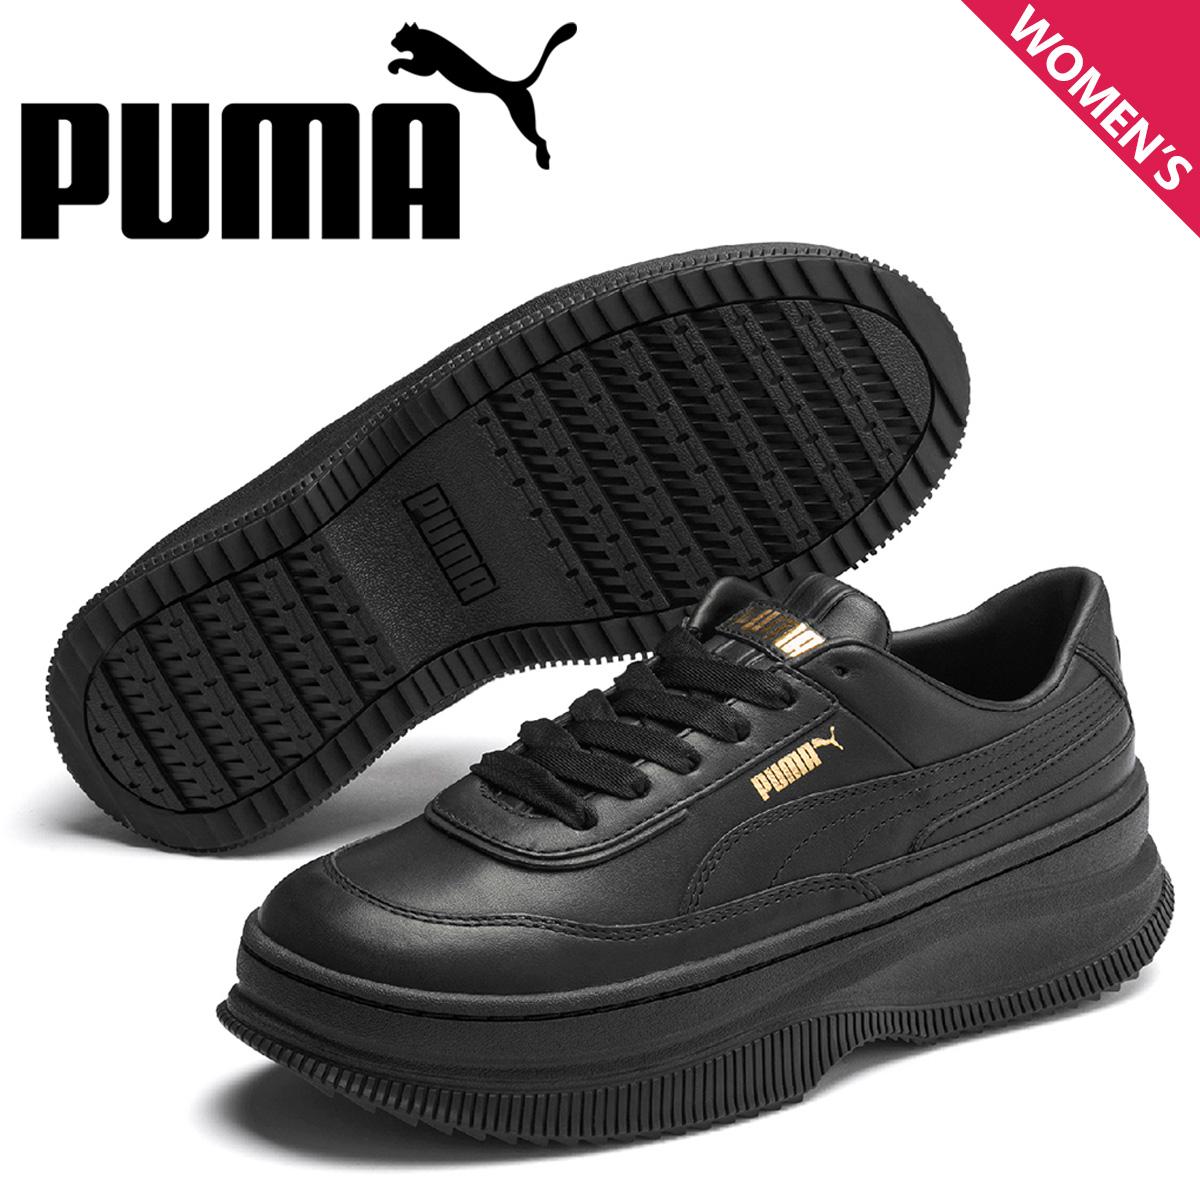 PUMA プーマ デバ スニーカー レディース 厚底 DEVA ブラック 黒 37119901 [予約 5月上旬 新入荷予定]